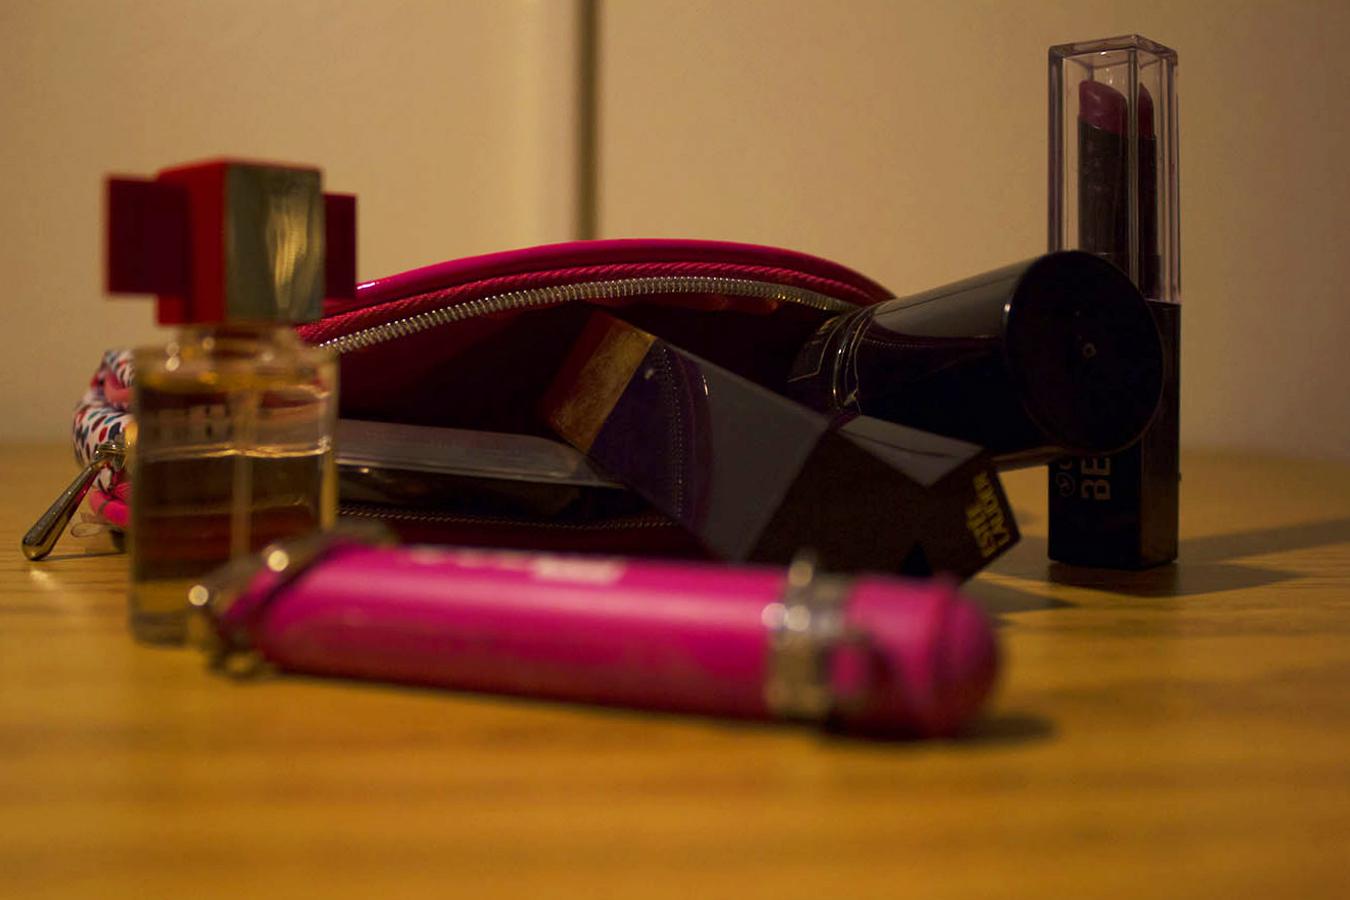 Tony_Ward_Studio_assignment_photographer_Lilibeth_Montero_purse_items_lipstick